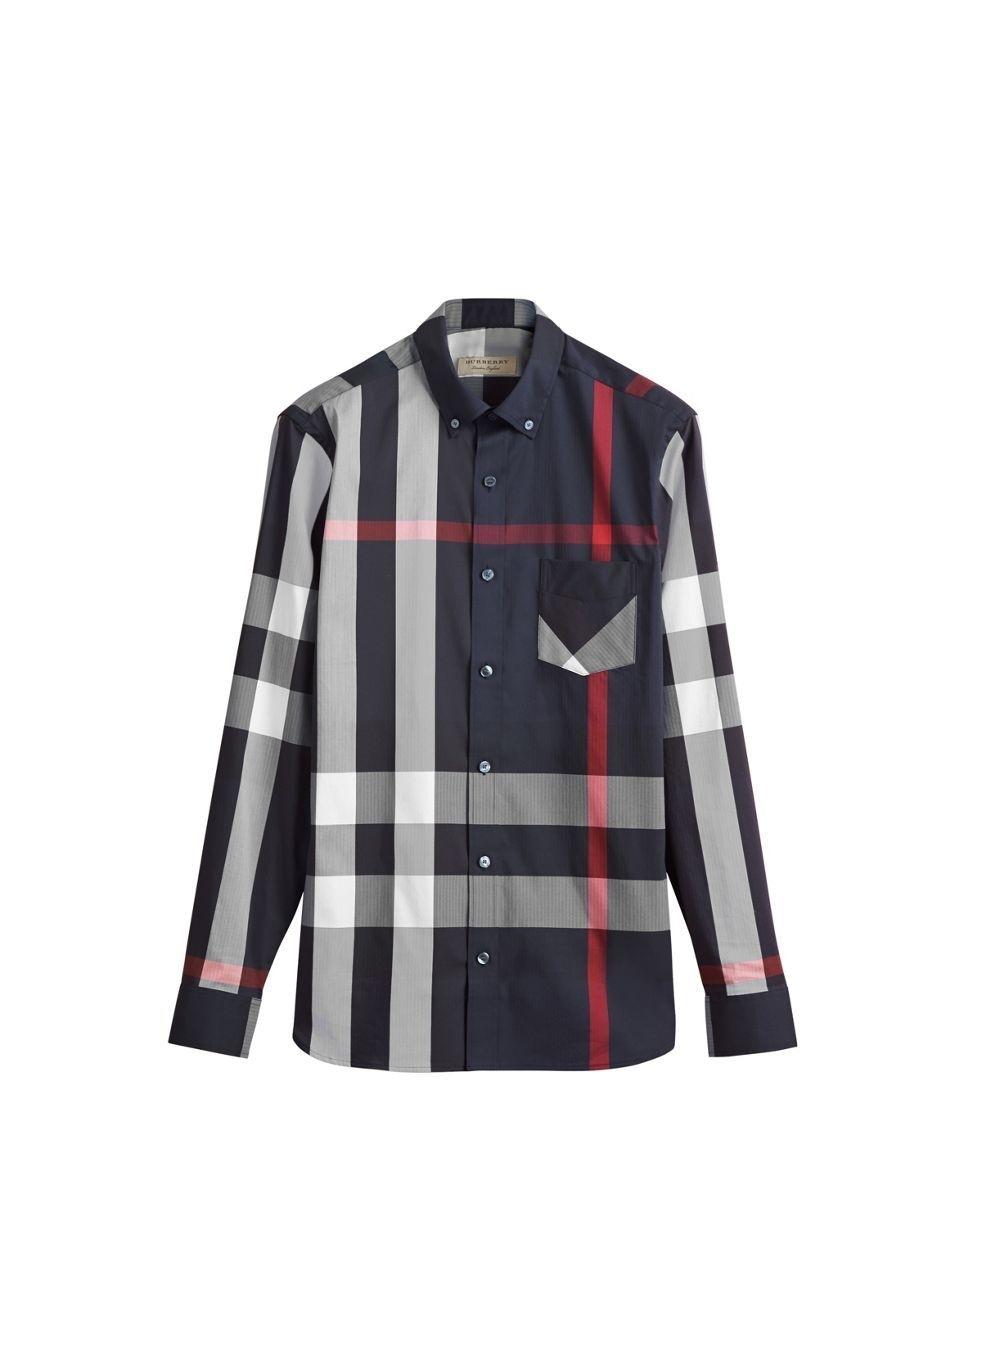 Burberry Shirts - Mens - Harvey Nichols d3f4952dfd